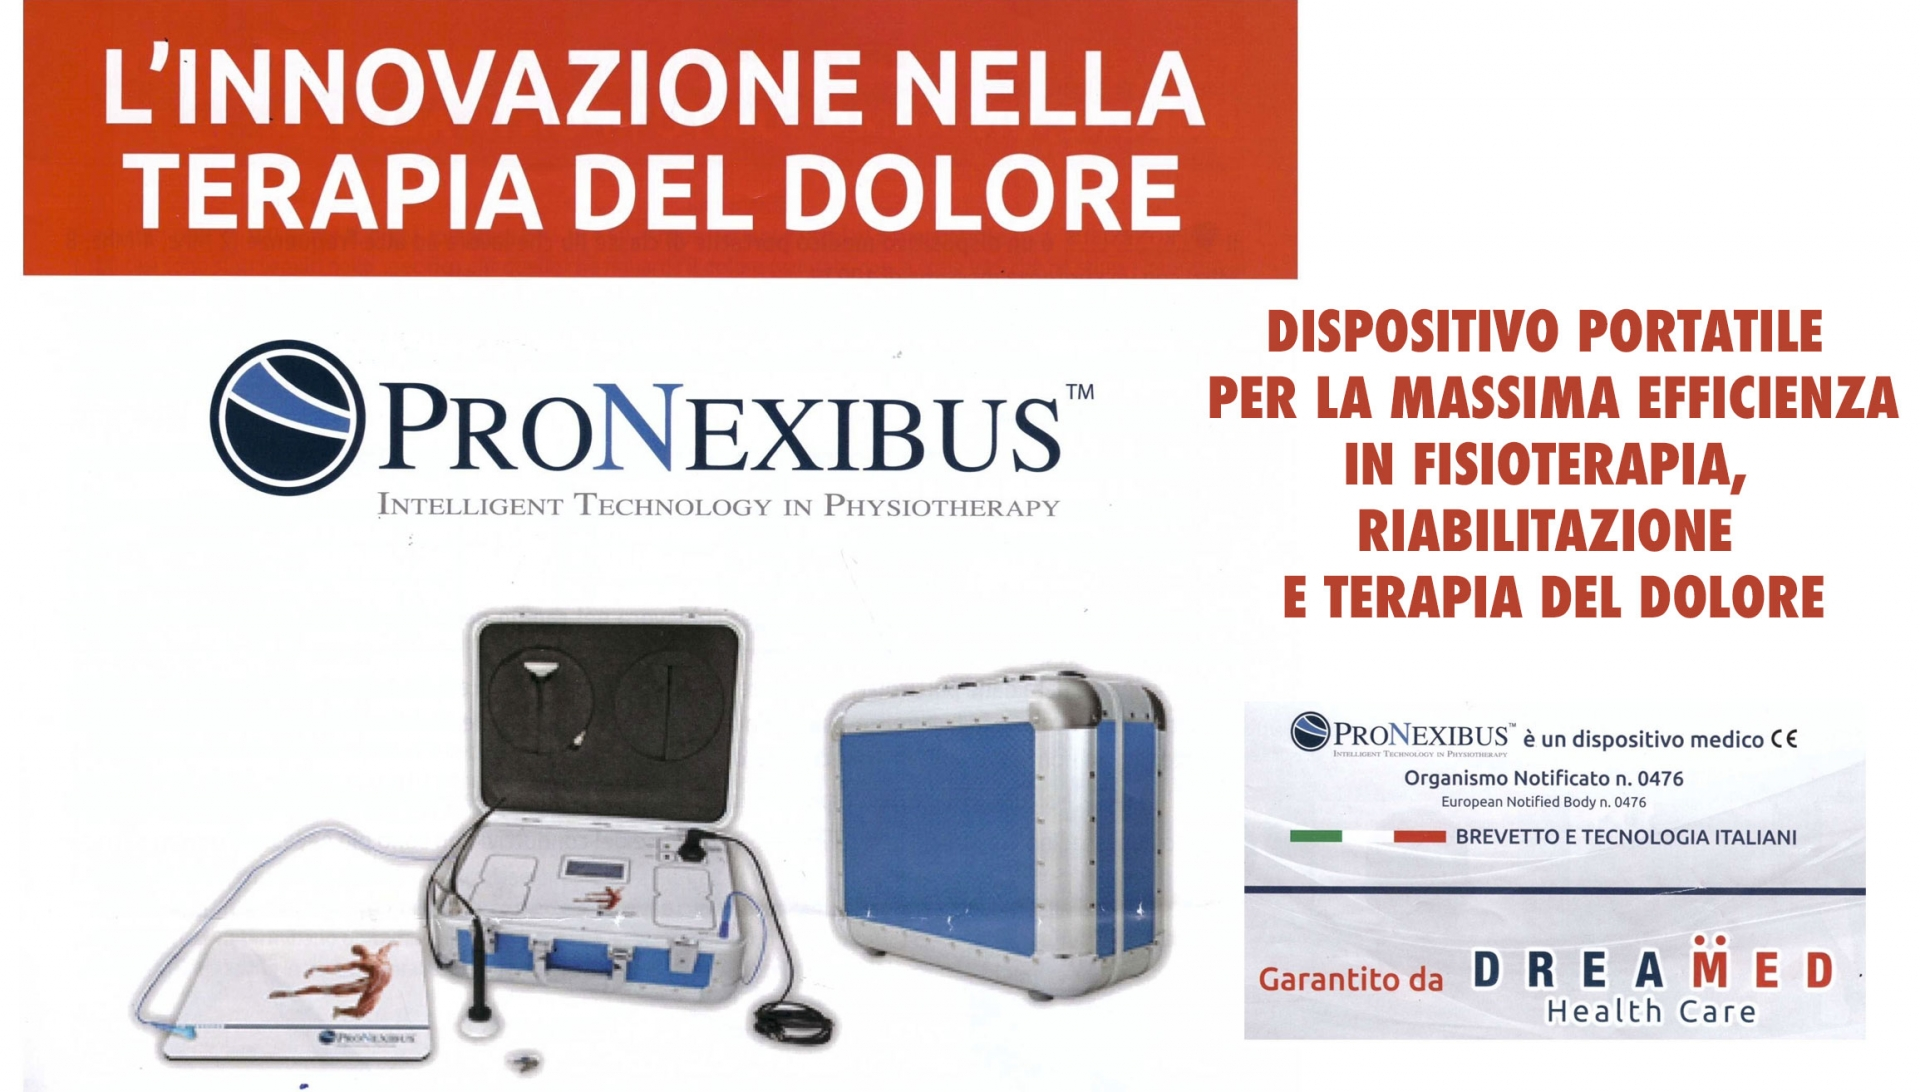 - Pronexibus